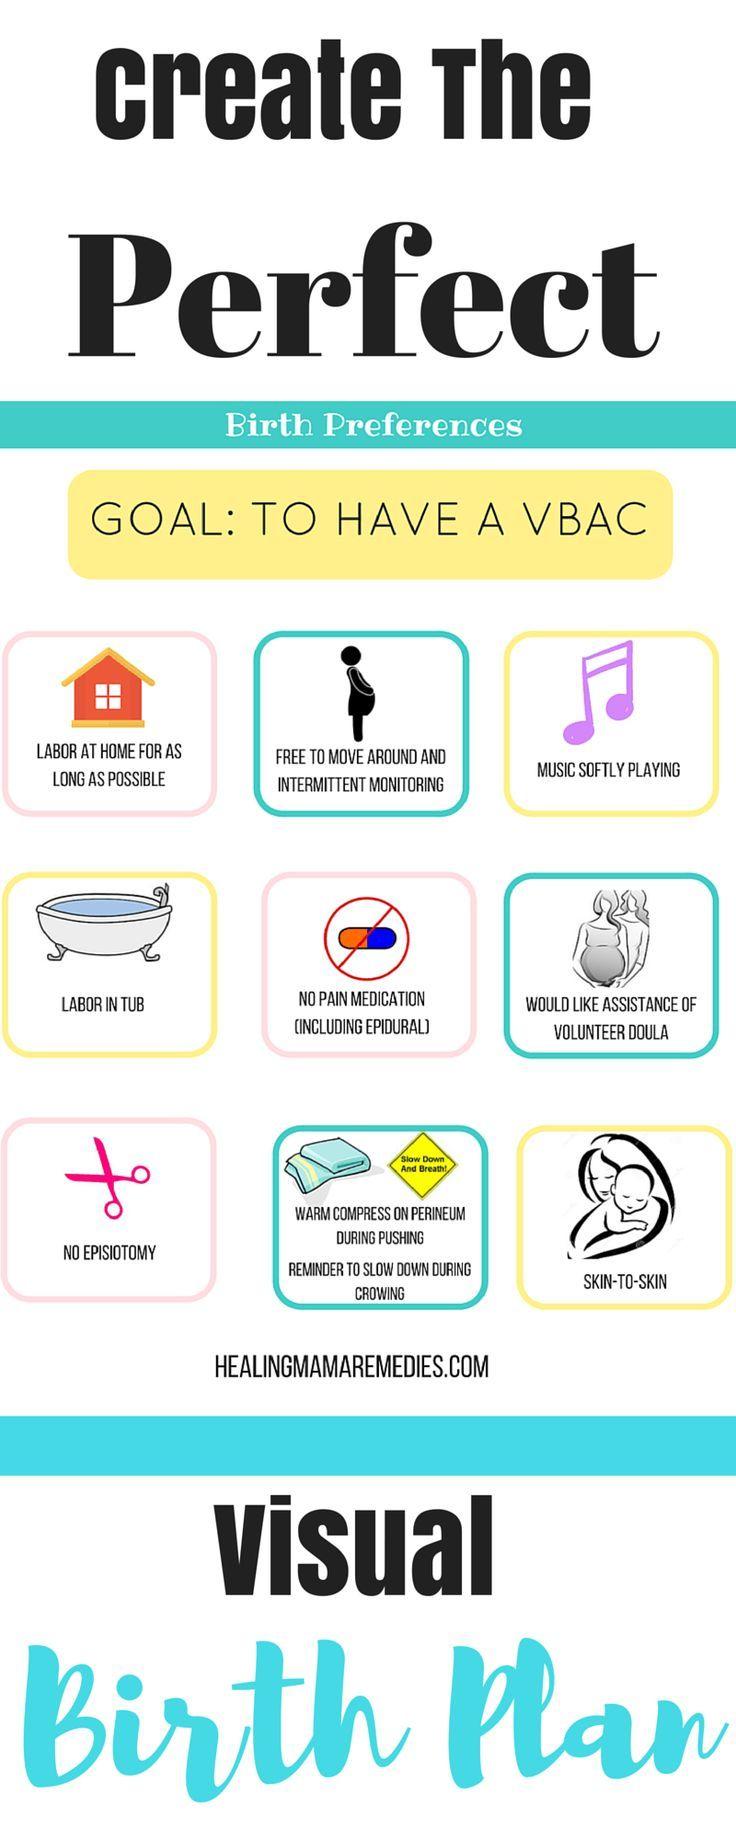 The 25 best Birth plans ideas – Birth Plans